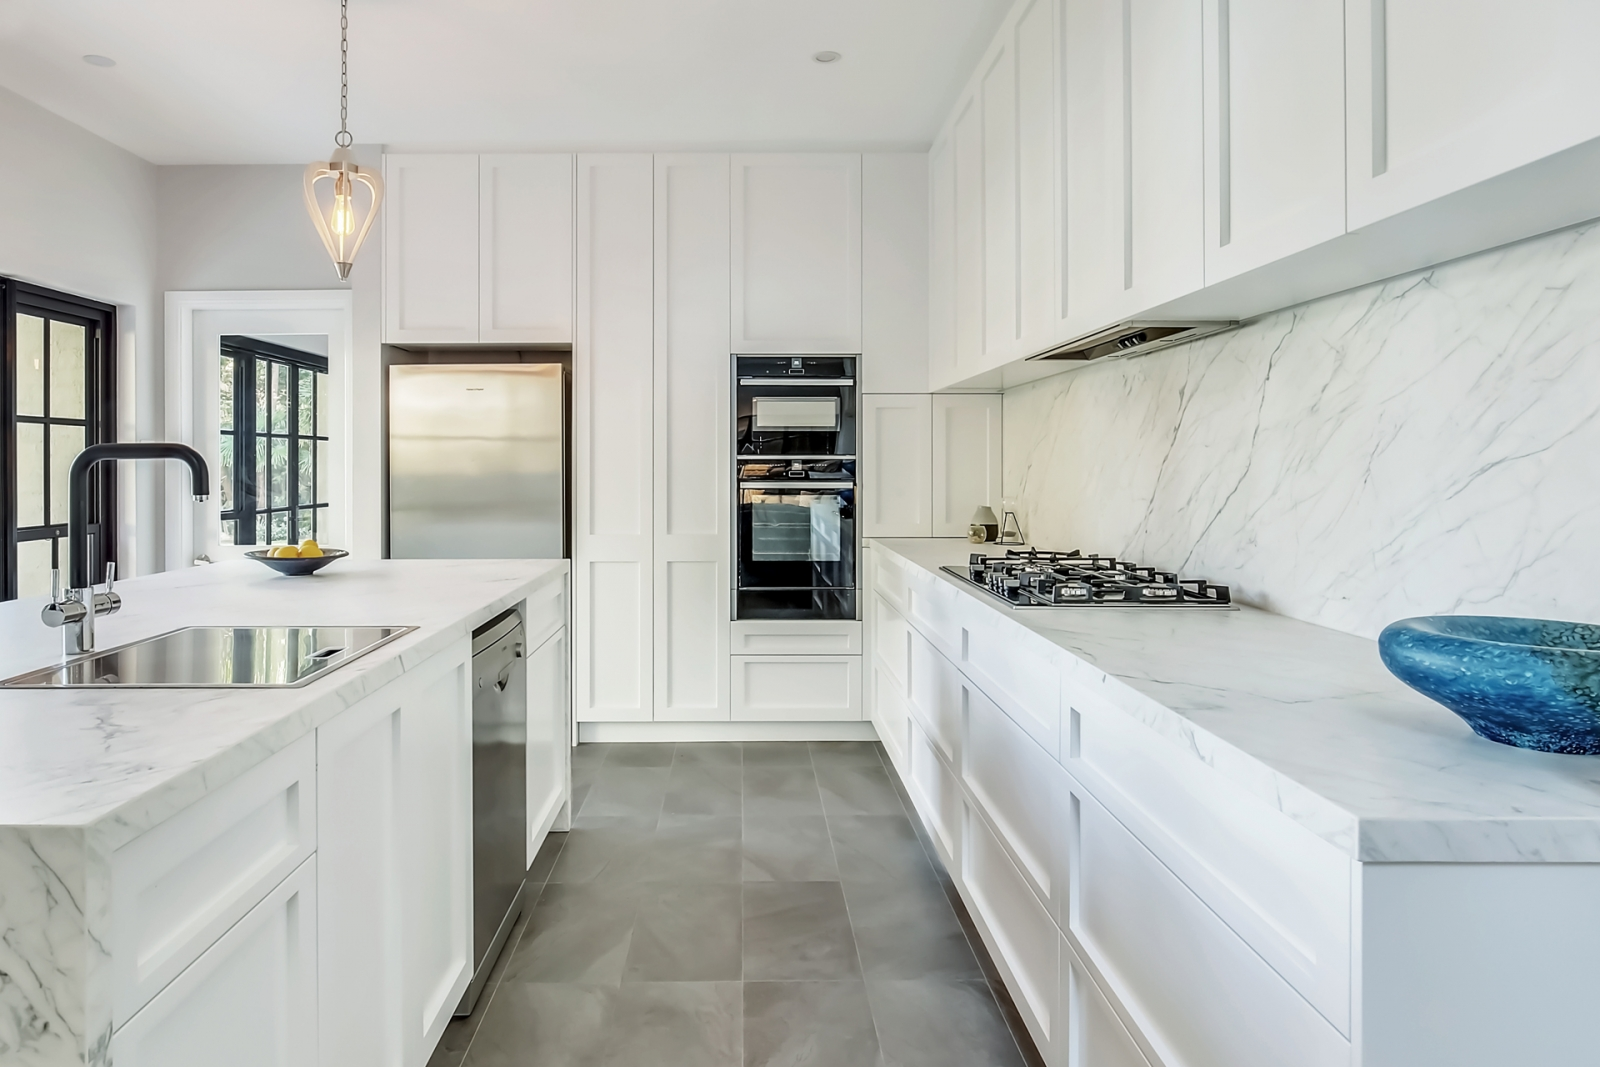 beaches kitchens